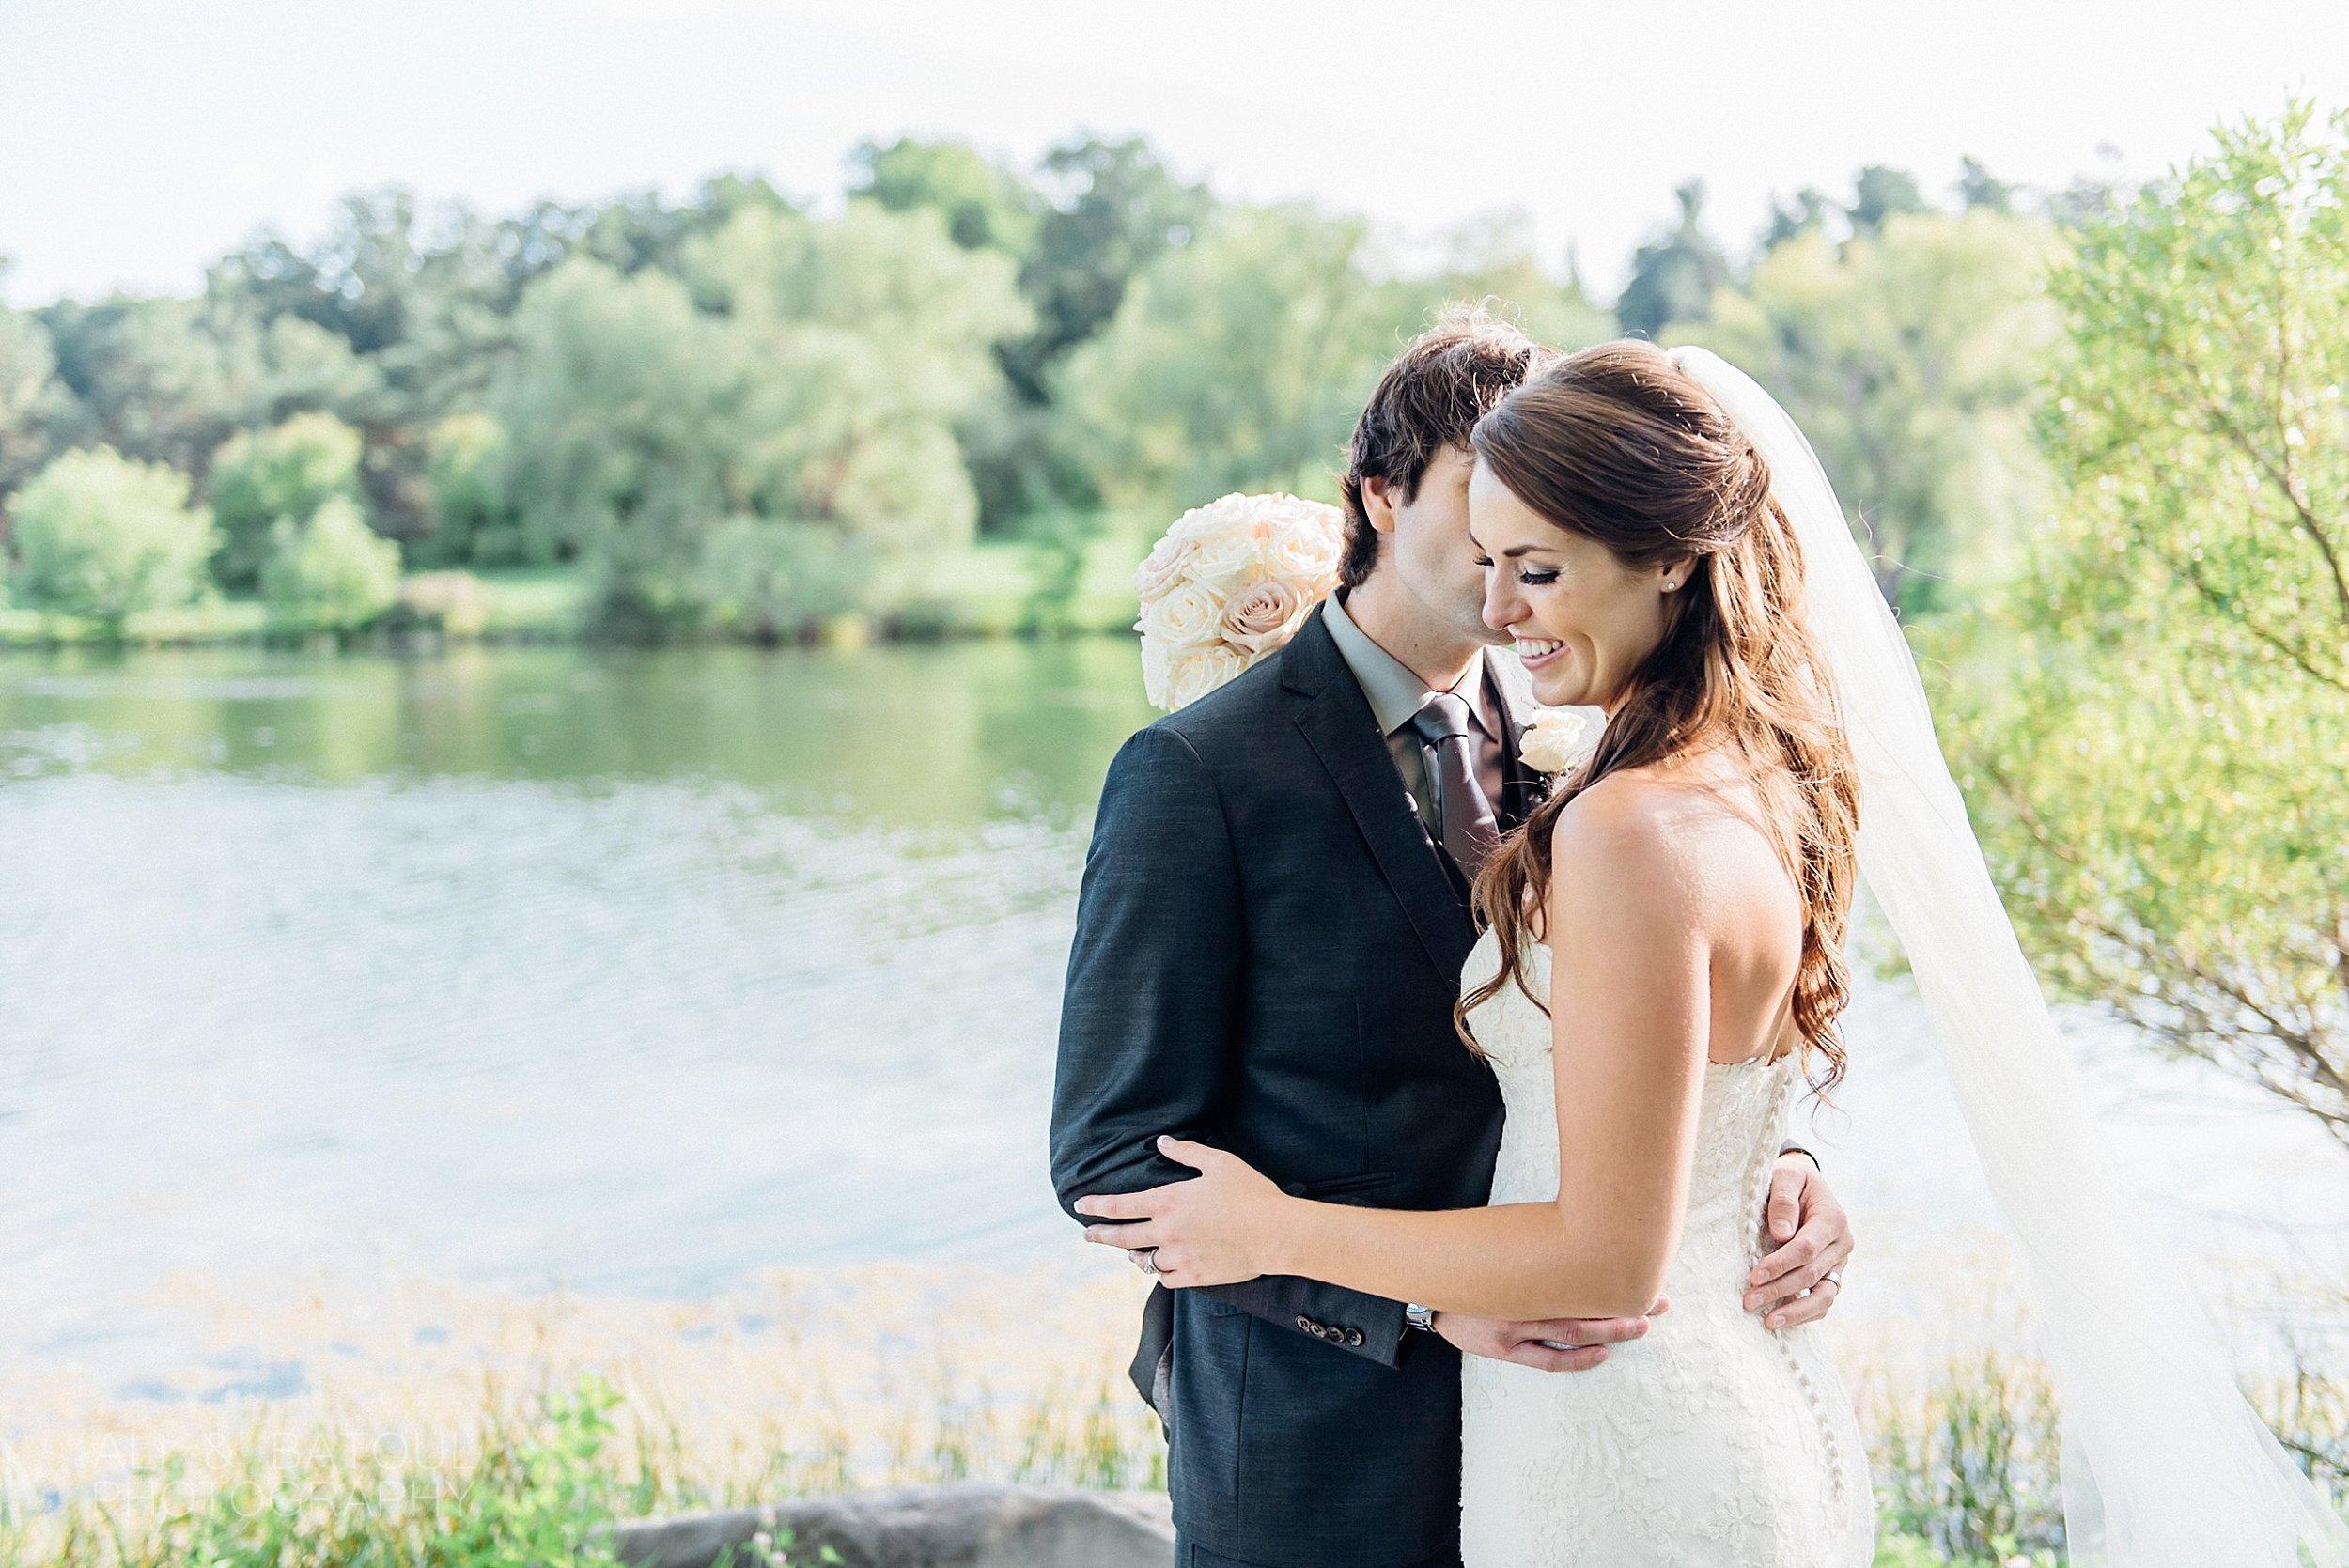 Ali & Batoul Photography - Documentary Fine Art Ottawa Wedding Photography_0060.jpg